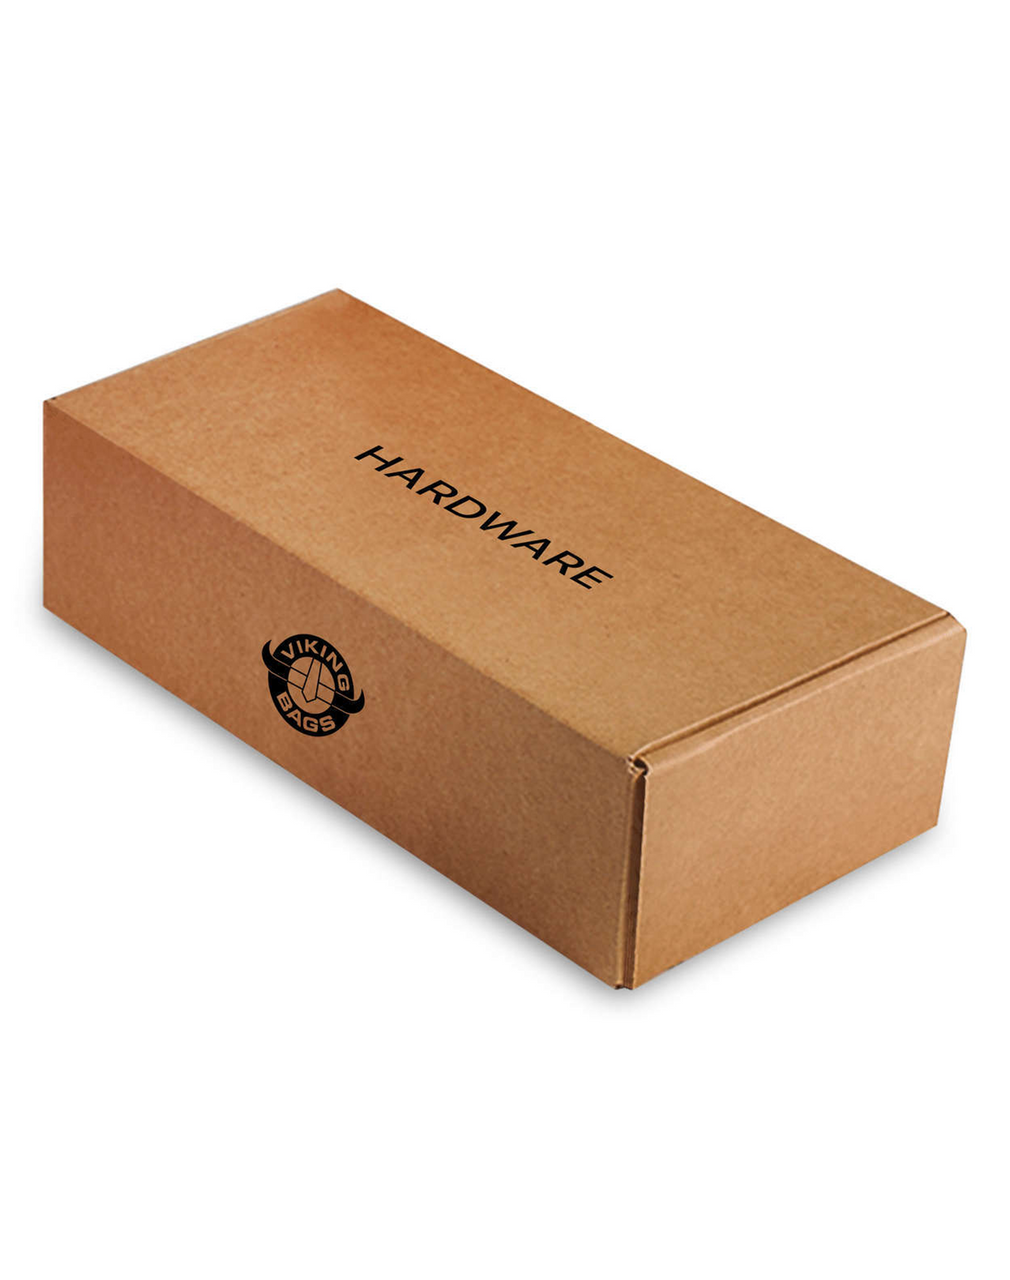 Viking Lamellar Extra Large Leather Covered Non-Shock Cutout Saddlebags For Harley Softail Custom FXSTC Hardware Box